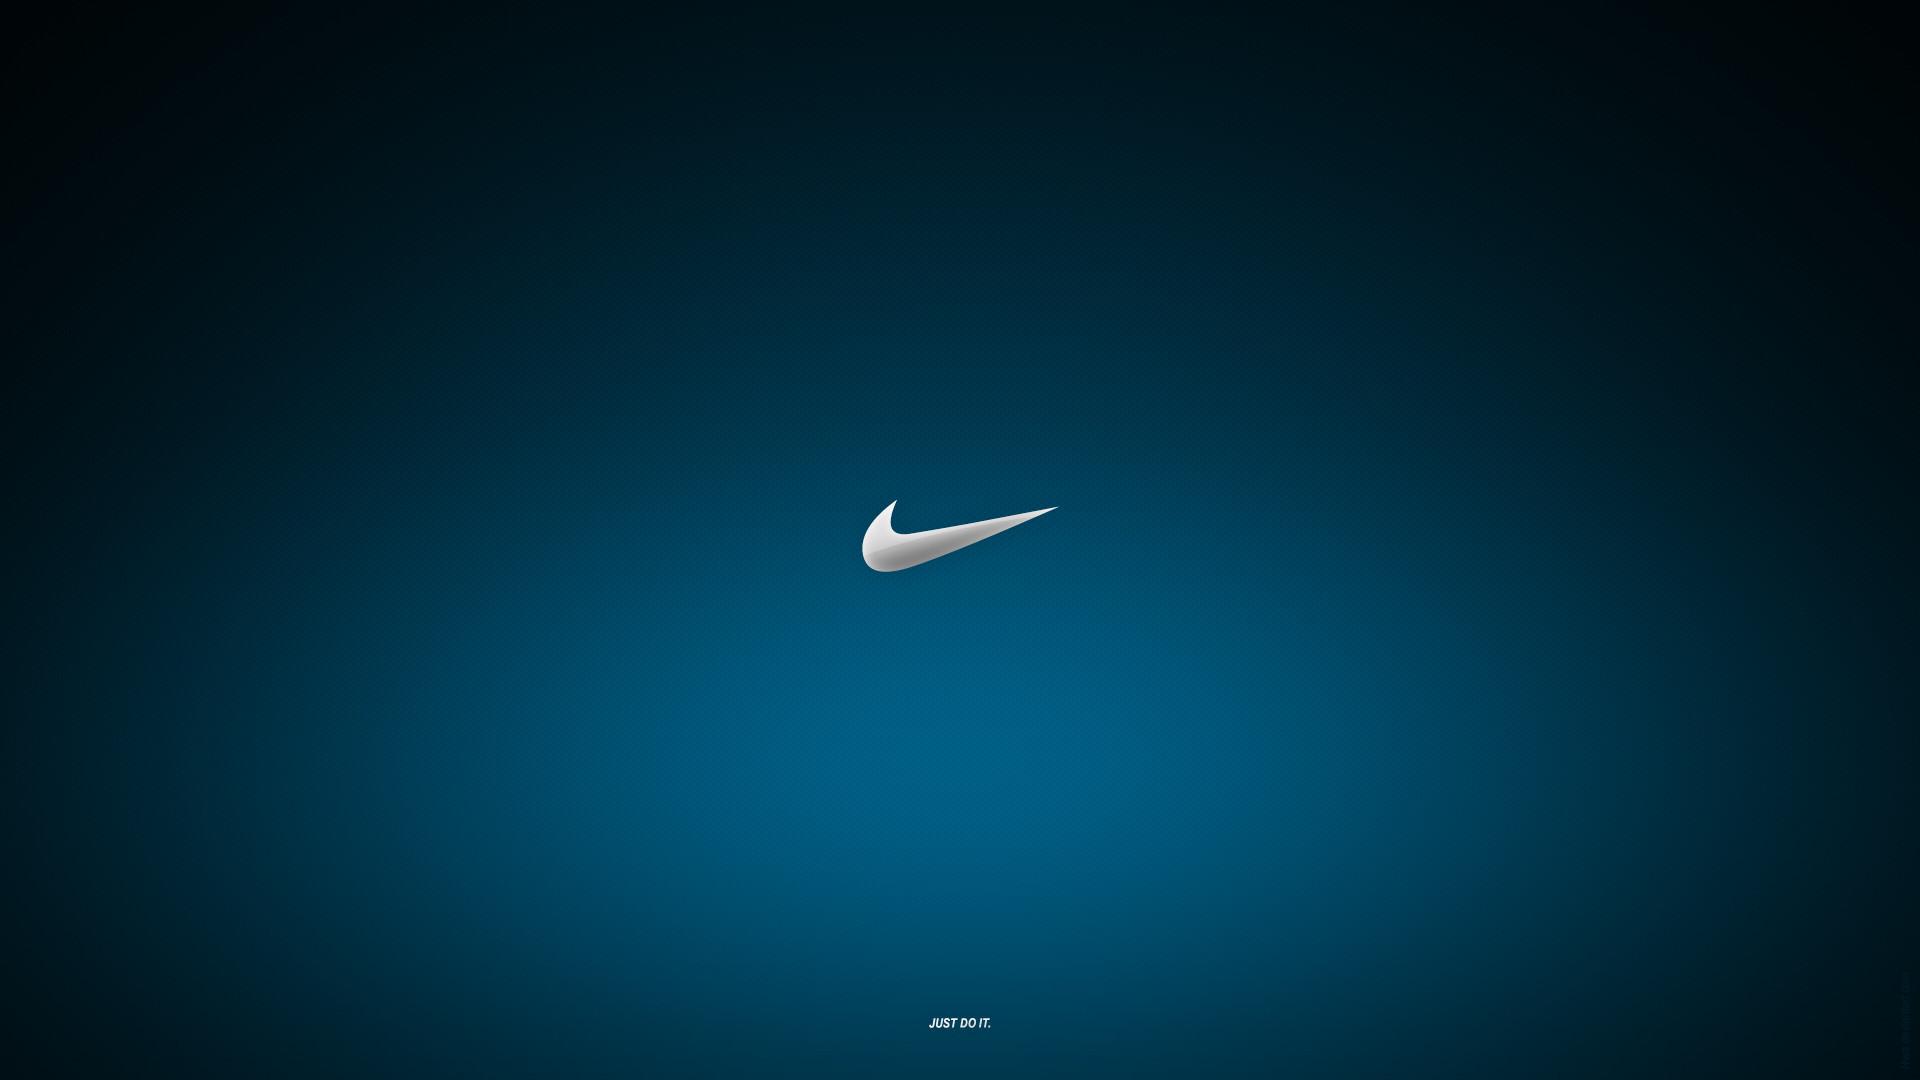 Cool Nike Logo Wallpaper HD